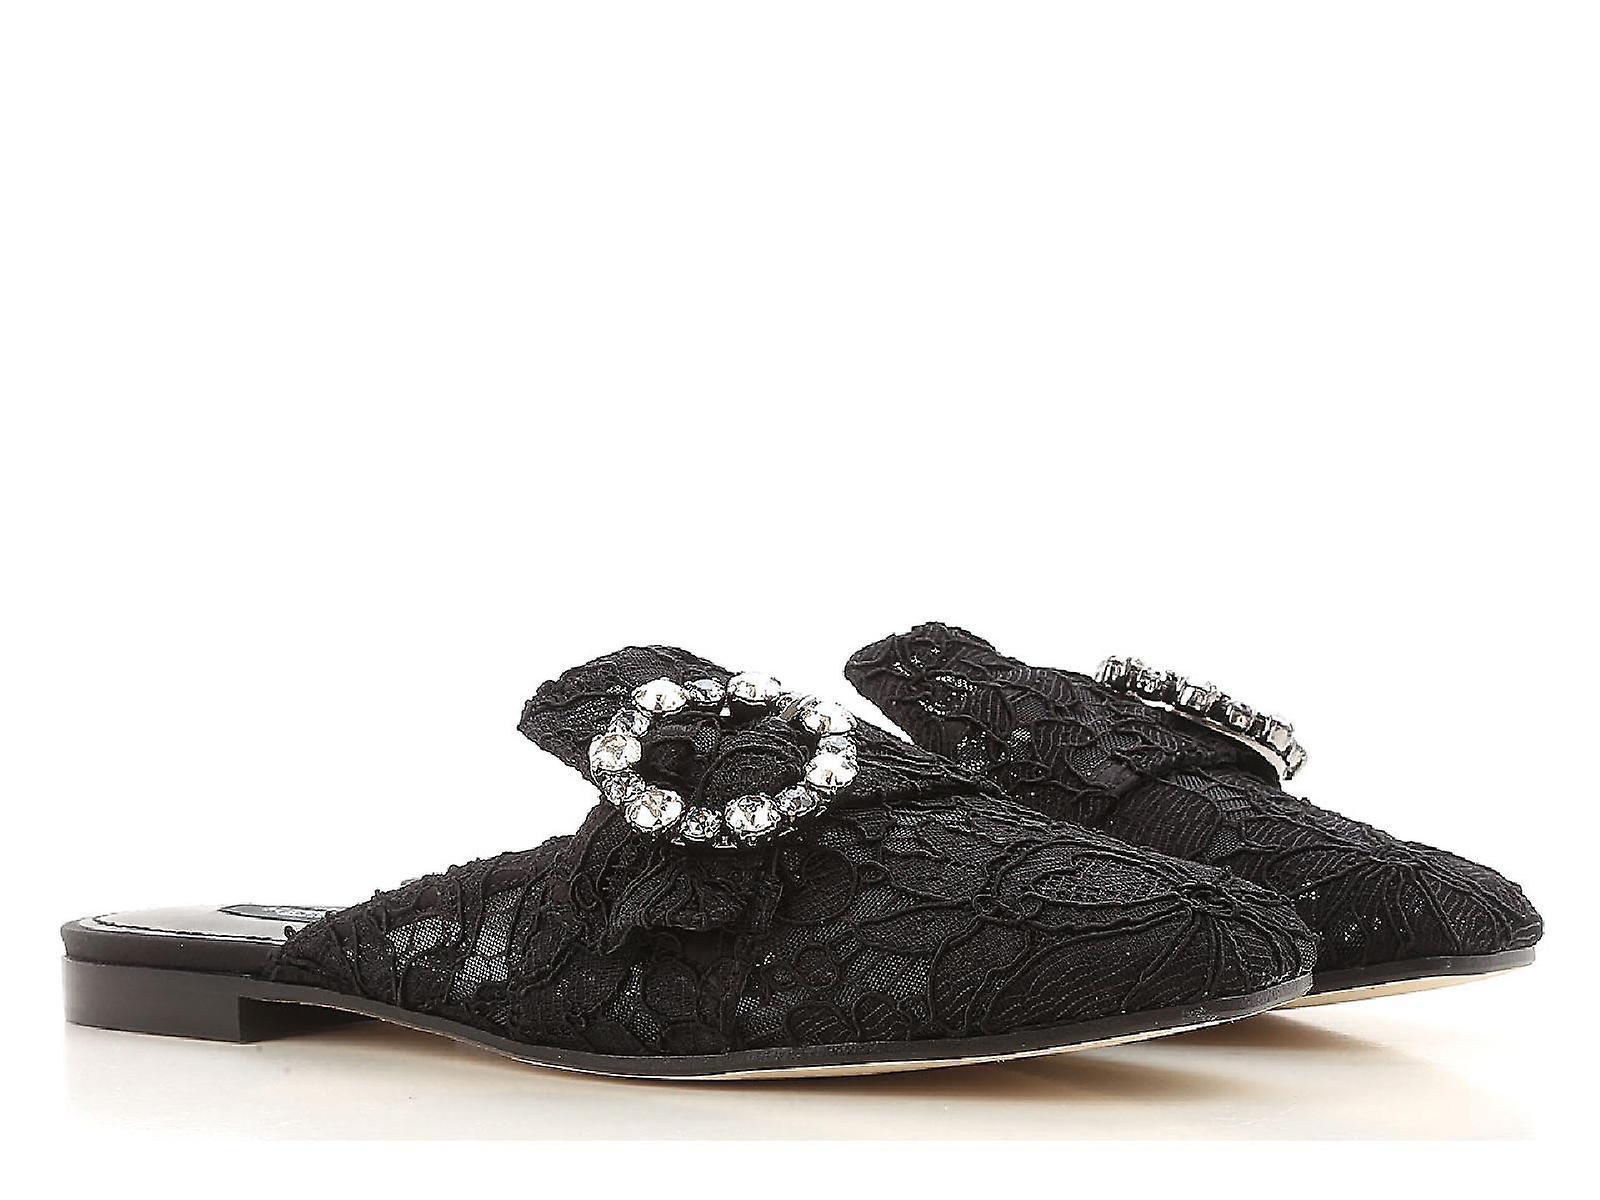 Dolce E Gabbana Ci0004al19880999 Women's Black Satin Slippers